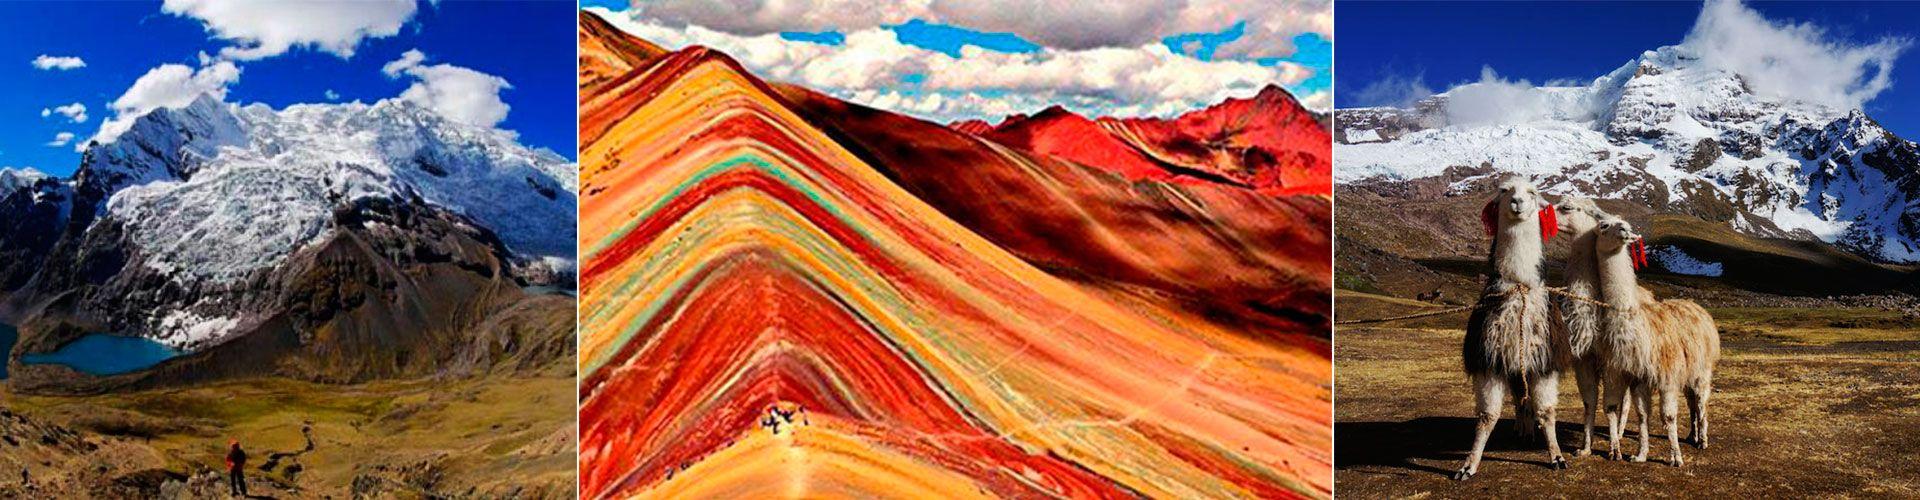 Ausangate + Rainbow Mountain Trek 7D/6N Soft